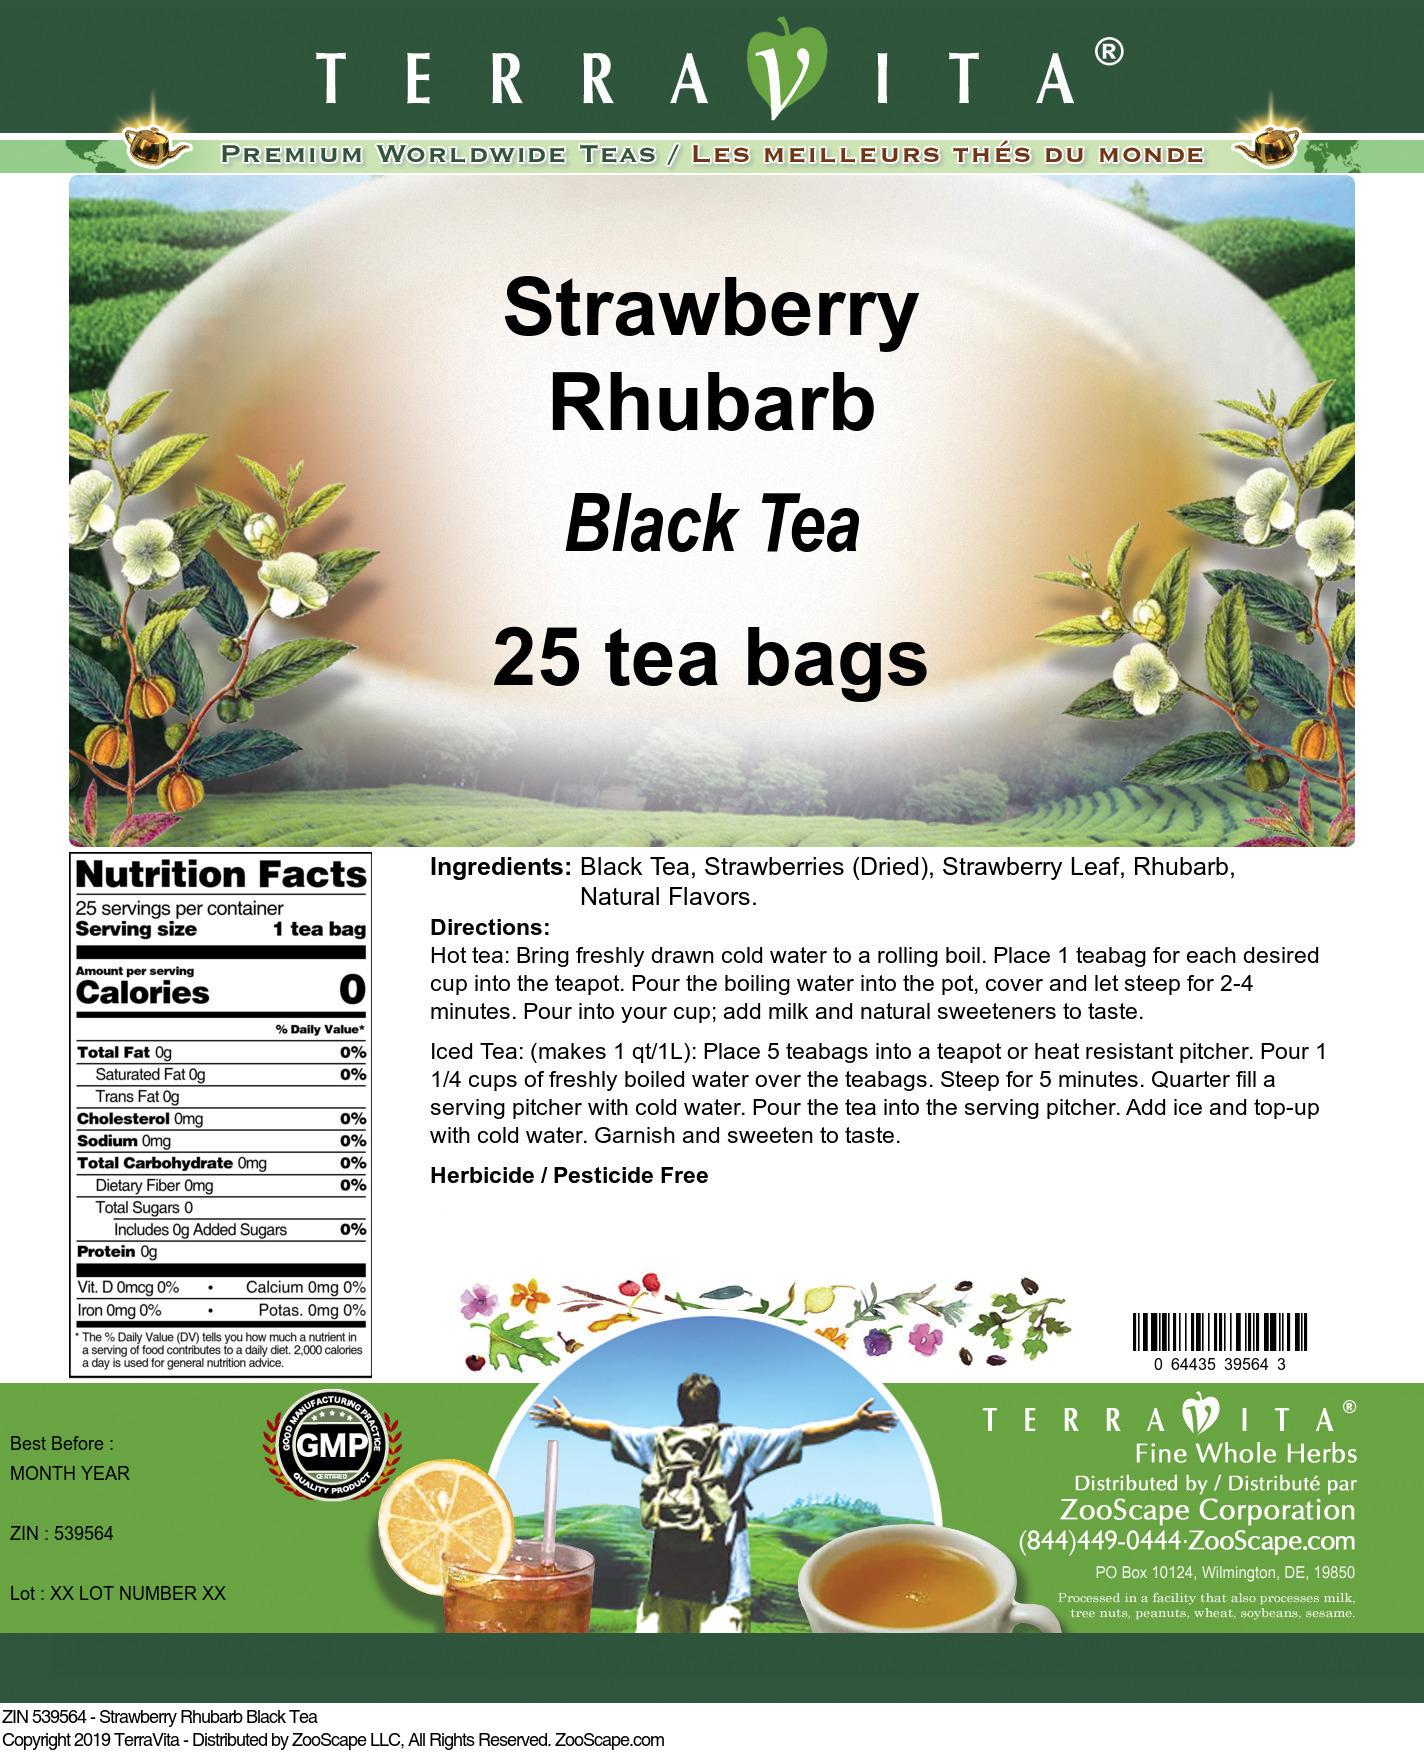 Strawberry Rhubarb Black Tea